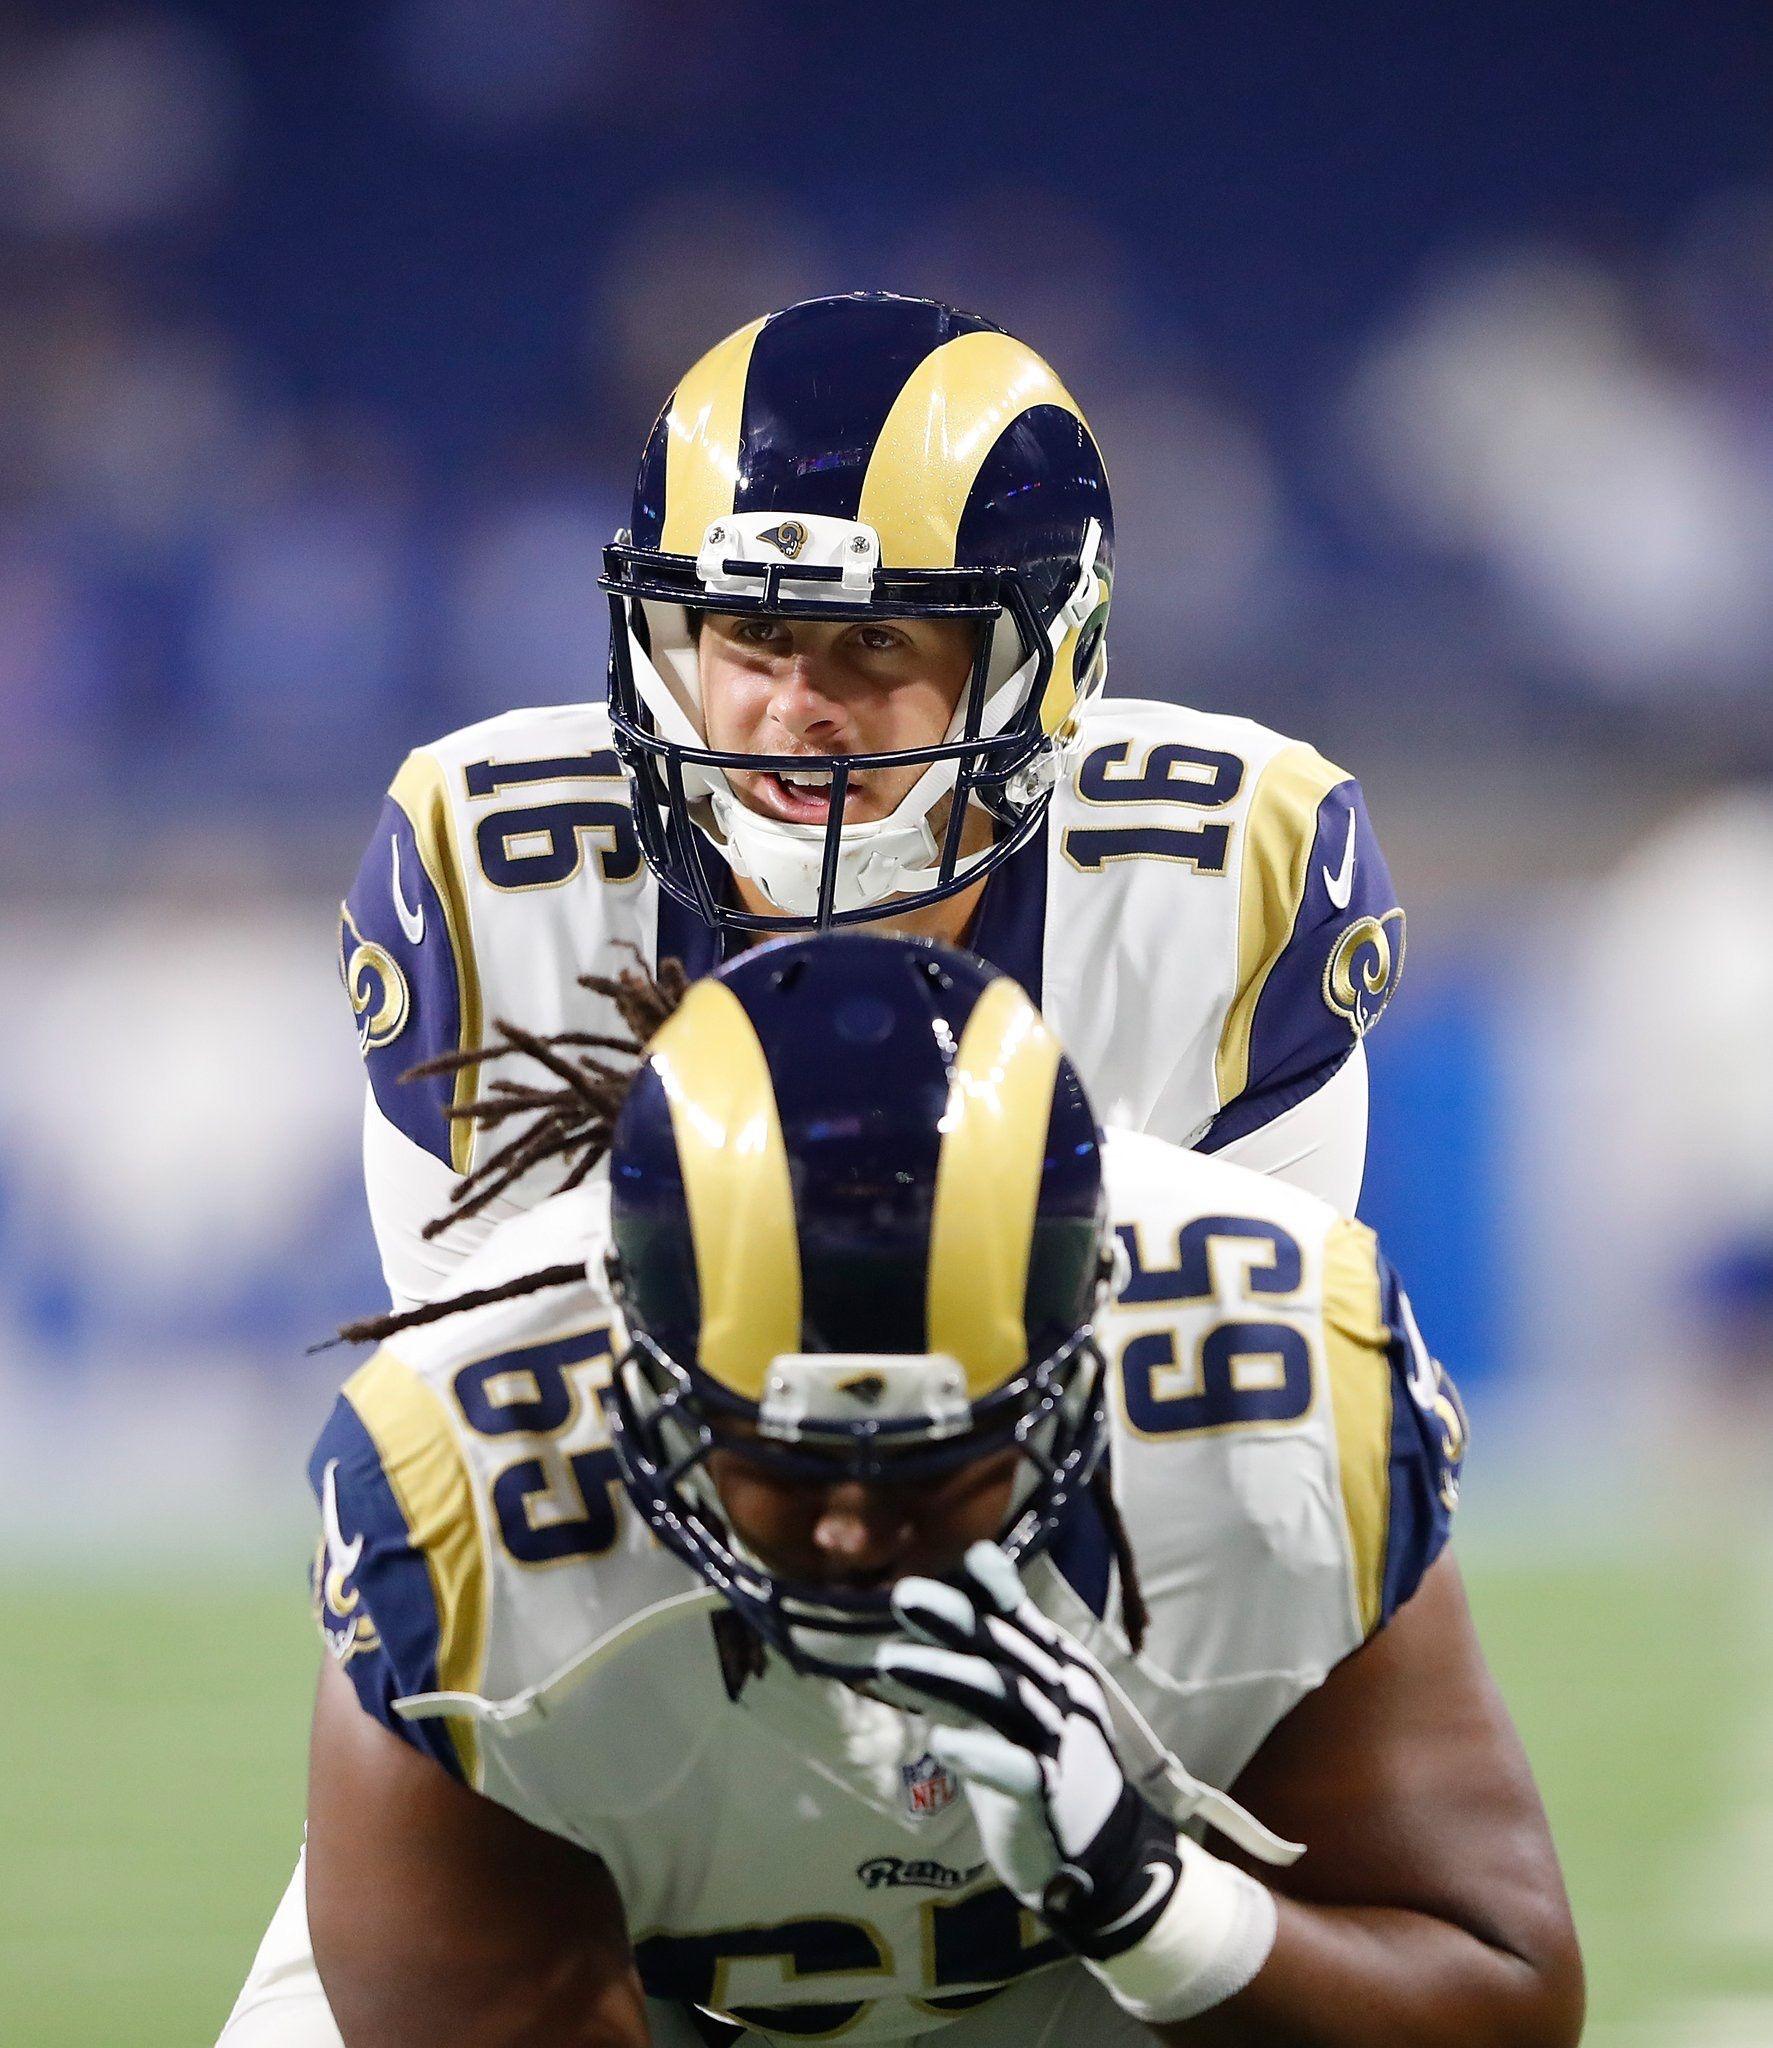 La Rams Jared Goff Qb 16 John Sullivan C 65 Rams Football Nfl Football Teams Nfl Rams